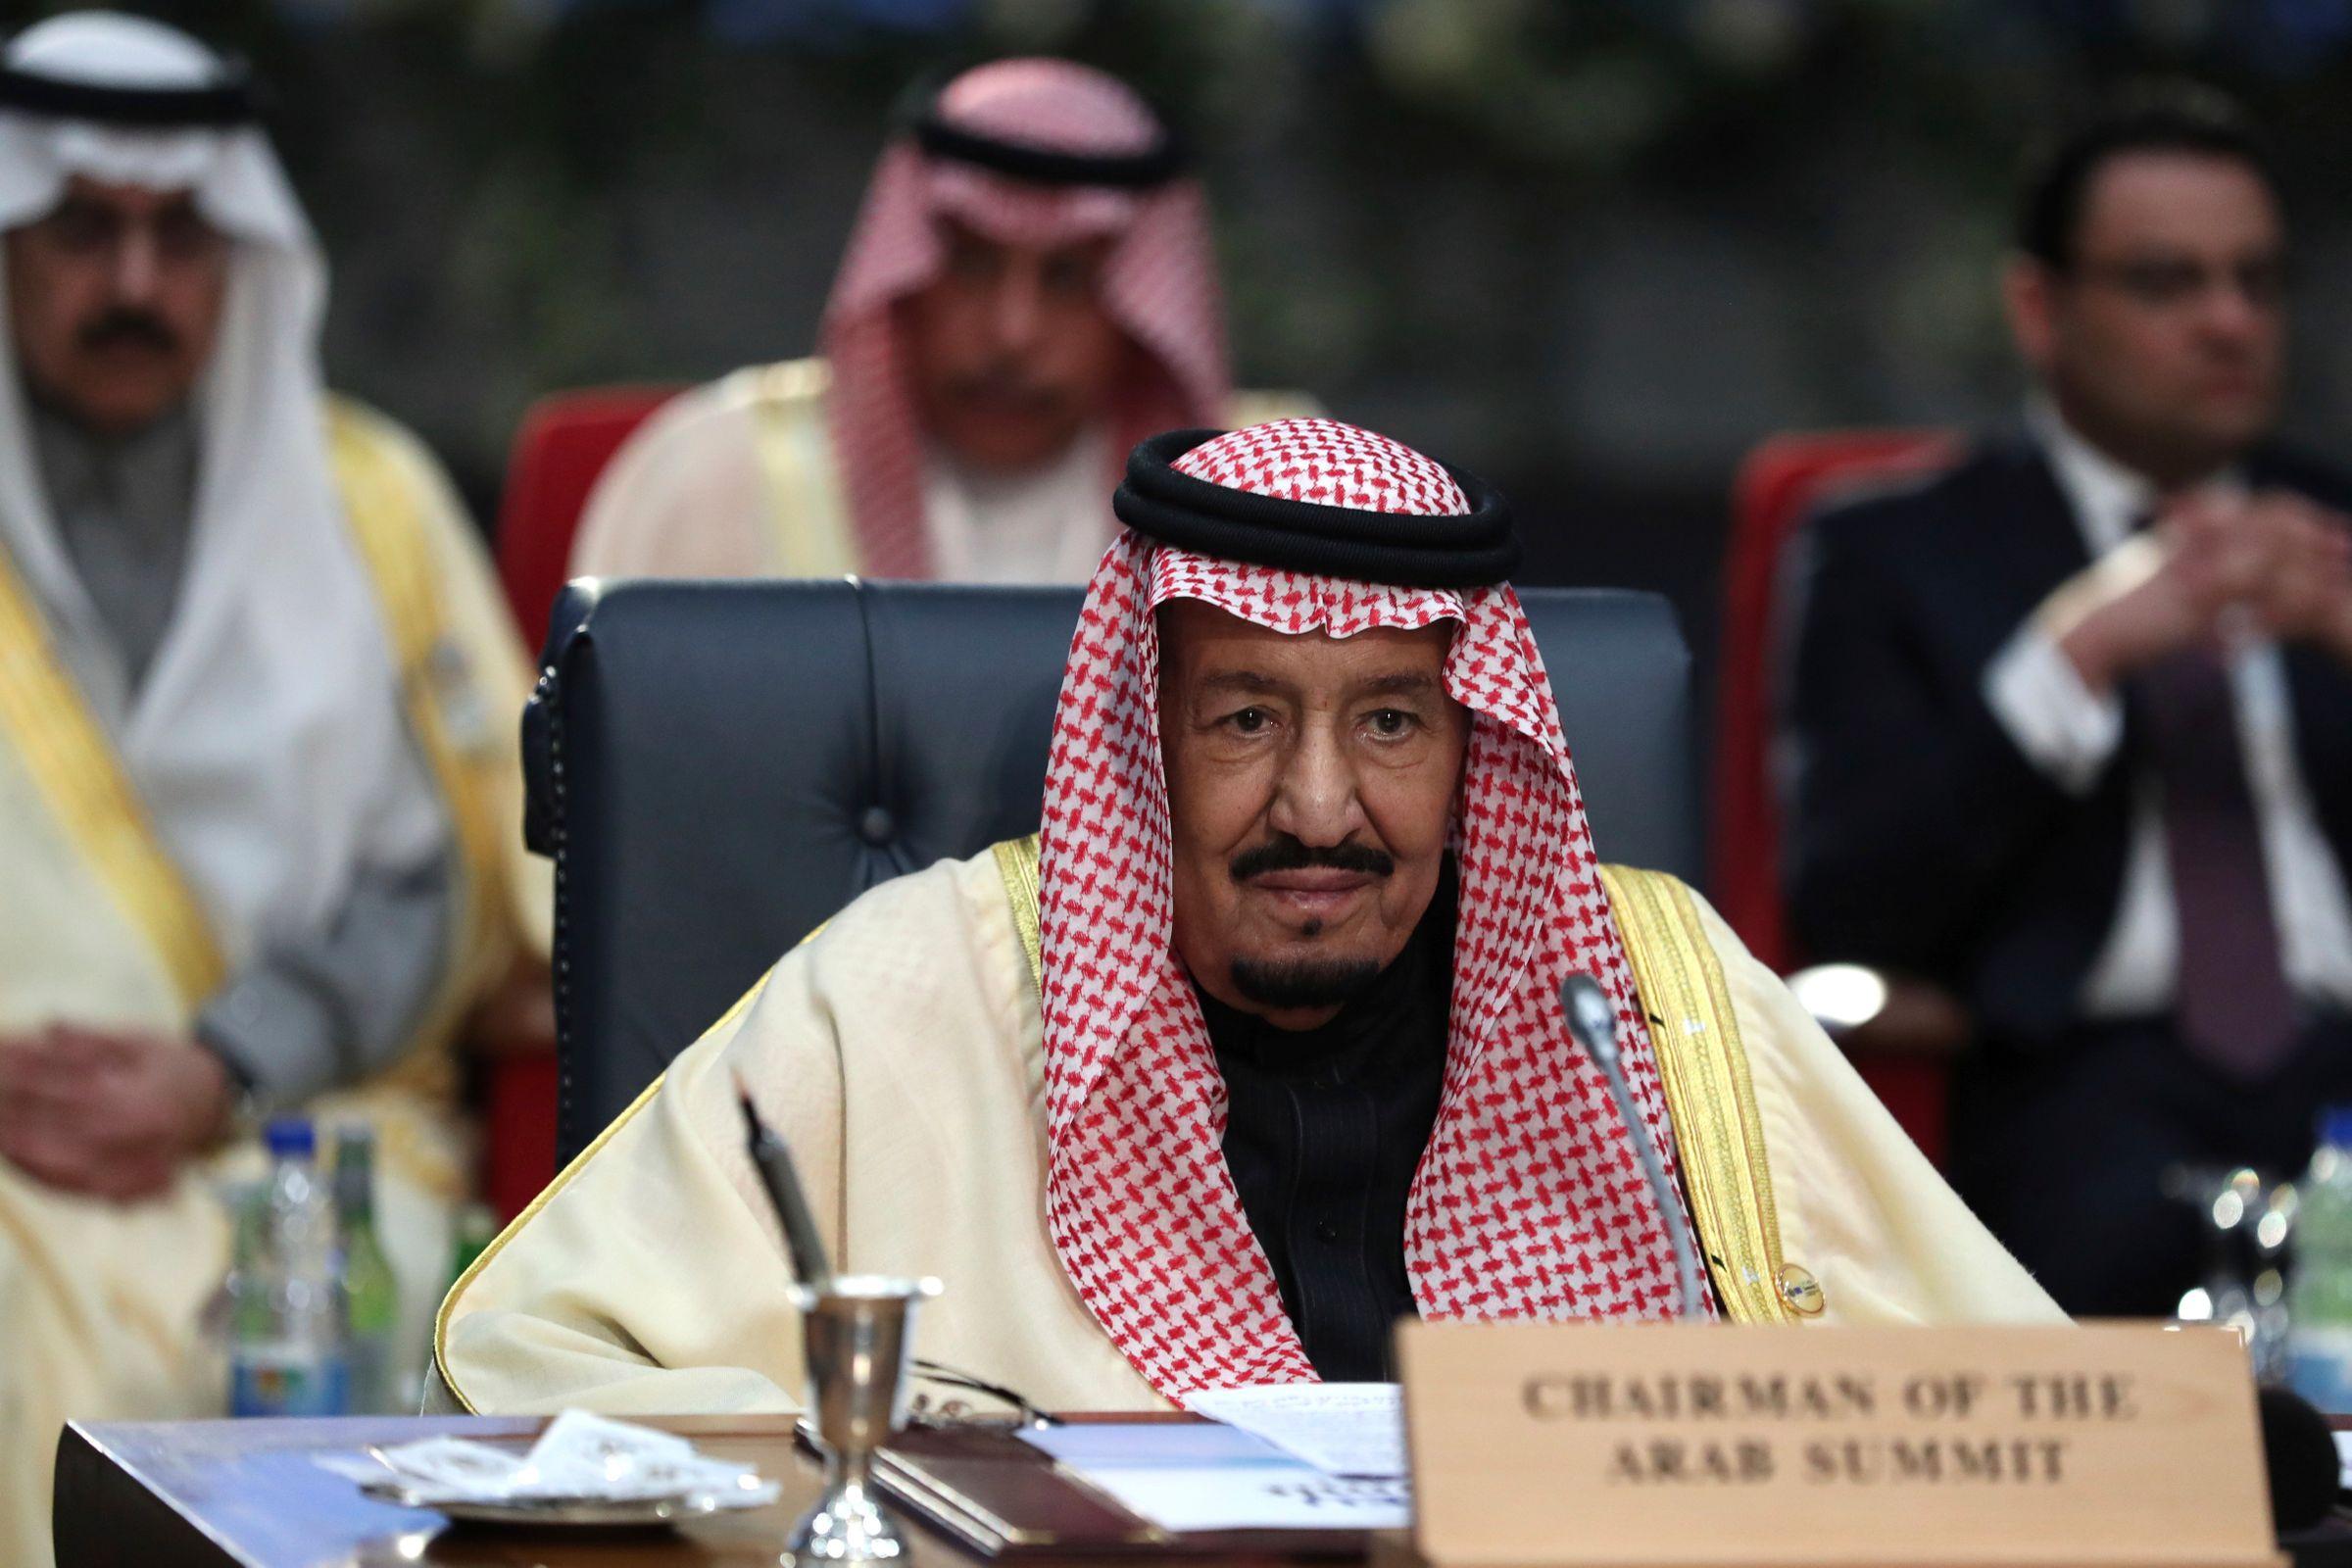 <p>Салман ибн Абдул-Азиз Аль Сауд. Фото © AP Photo / Francisco Seco</p>